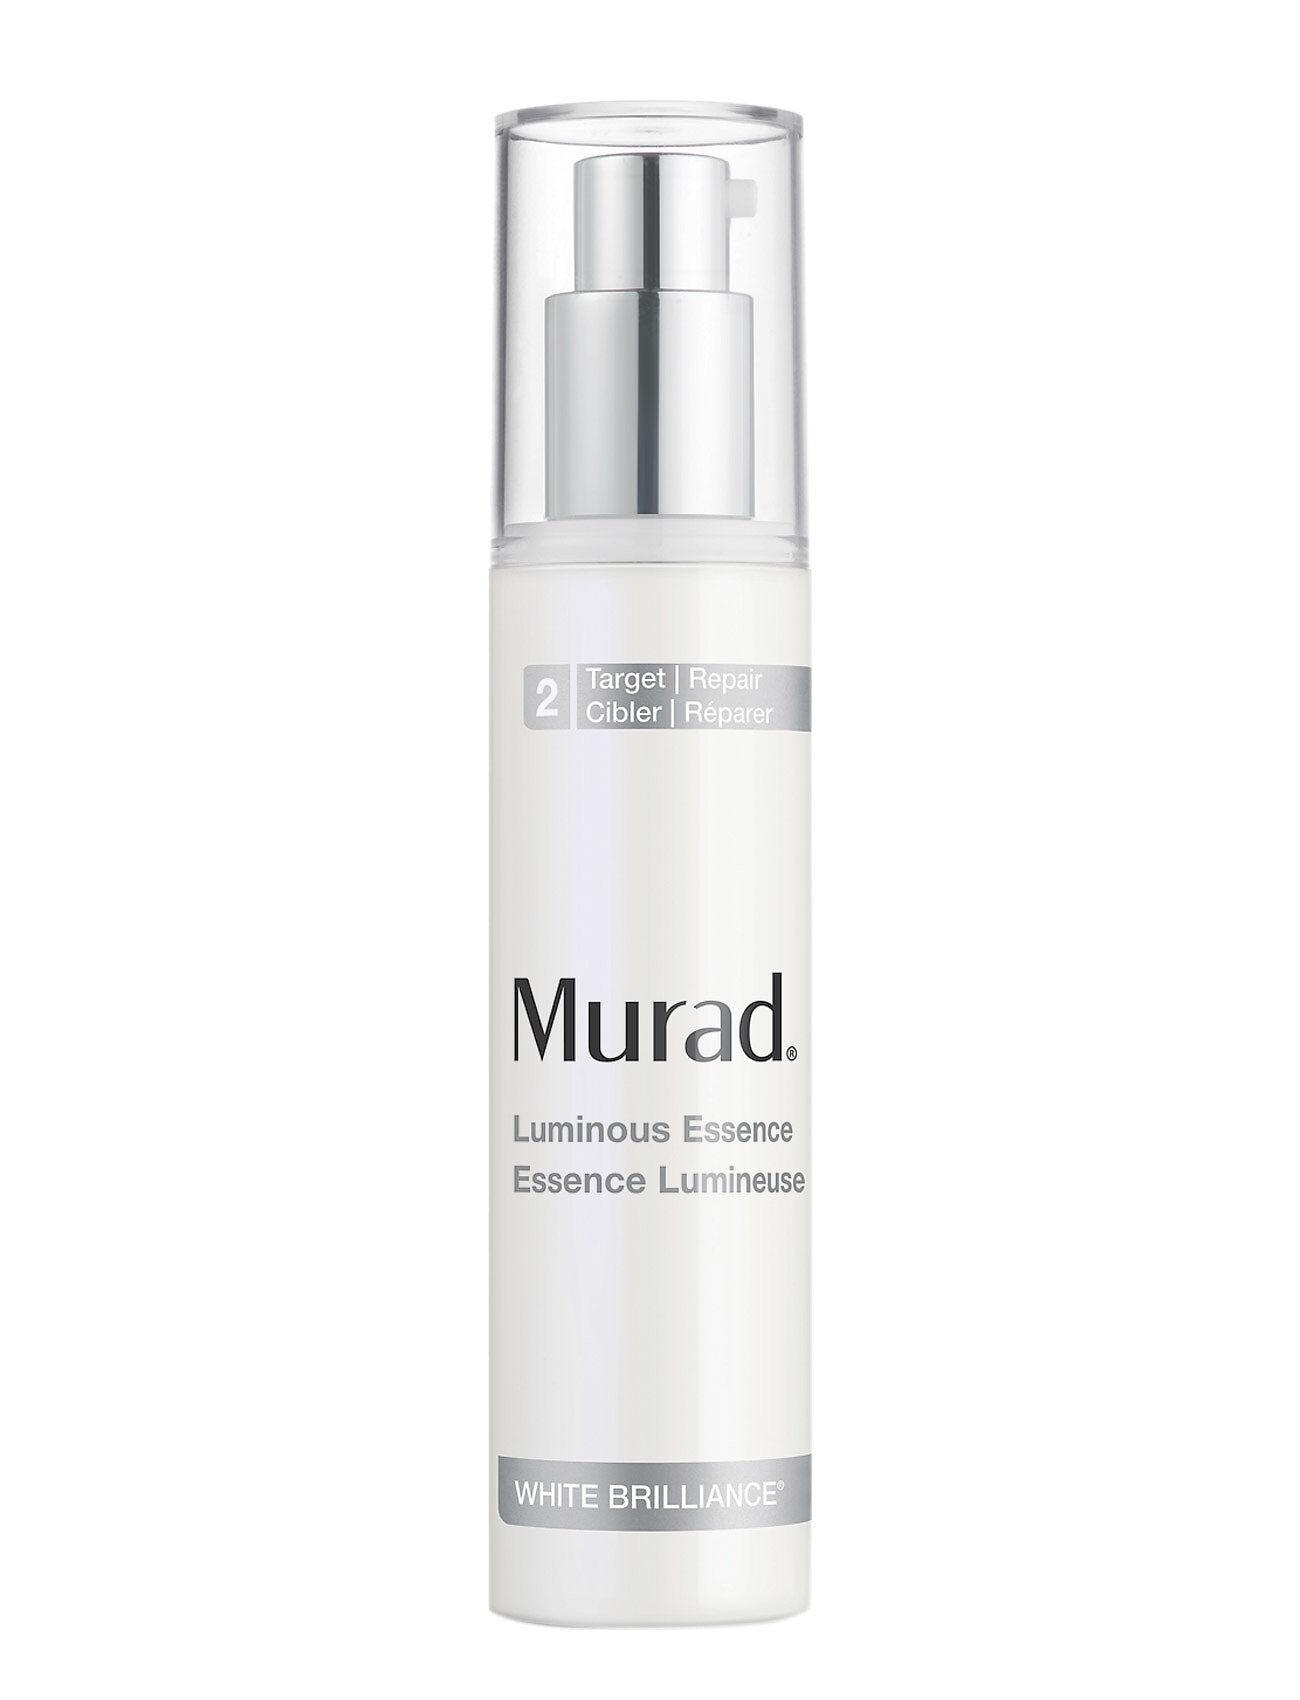 Murad White Brilliance Luminous Essence Kuorinta-aine Kasvojen Kuorinta Nude Murad